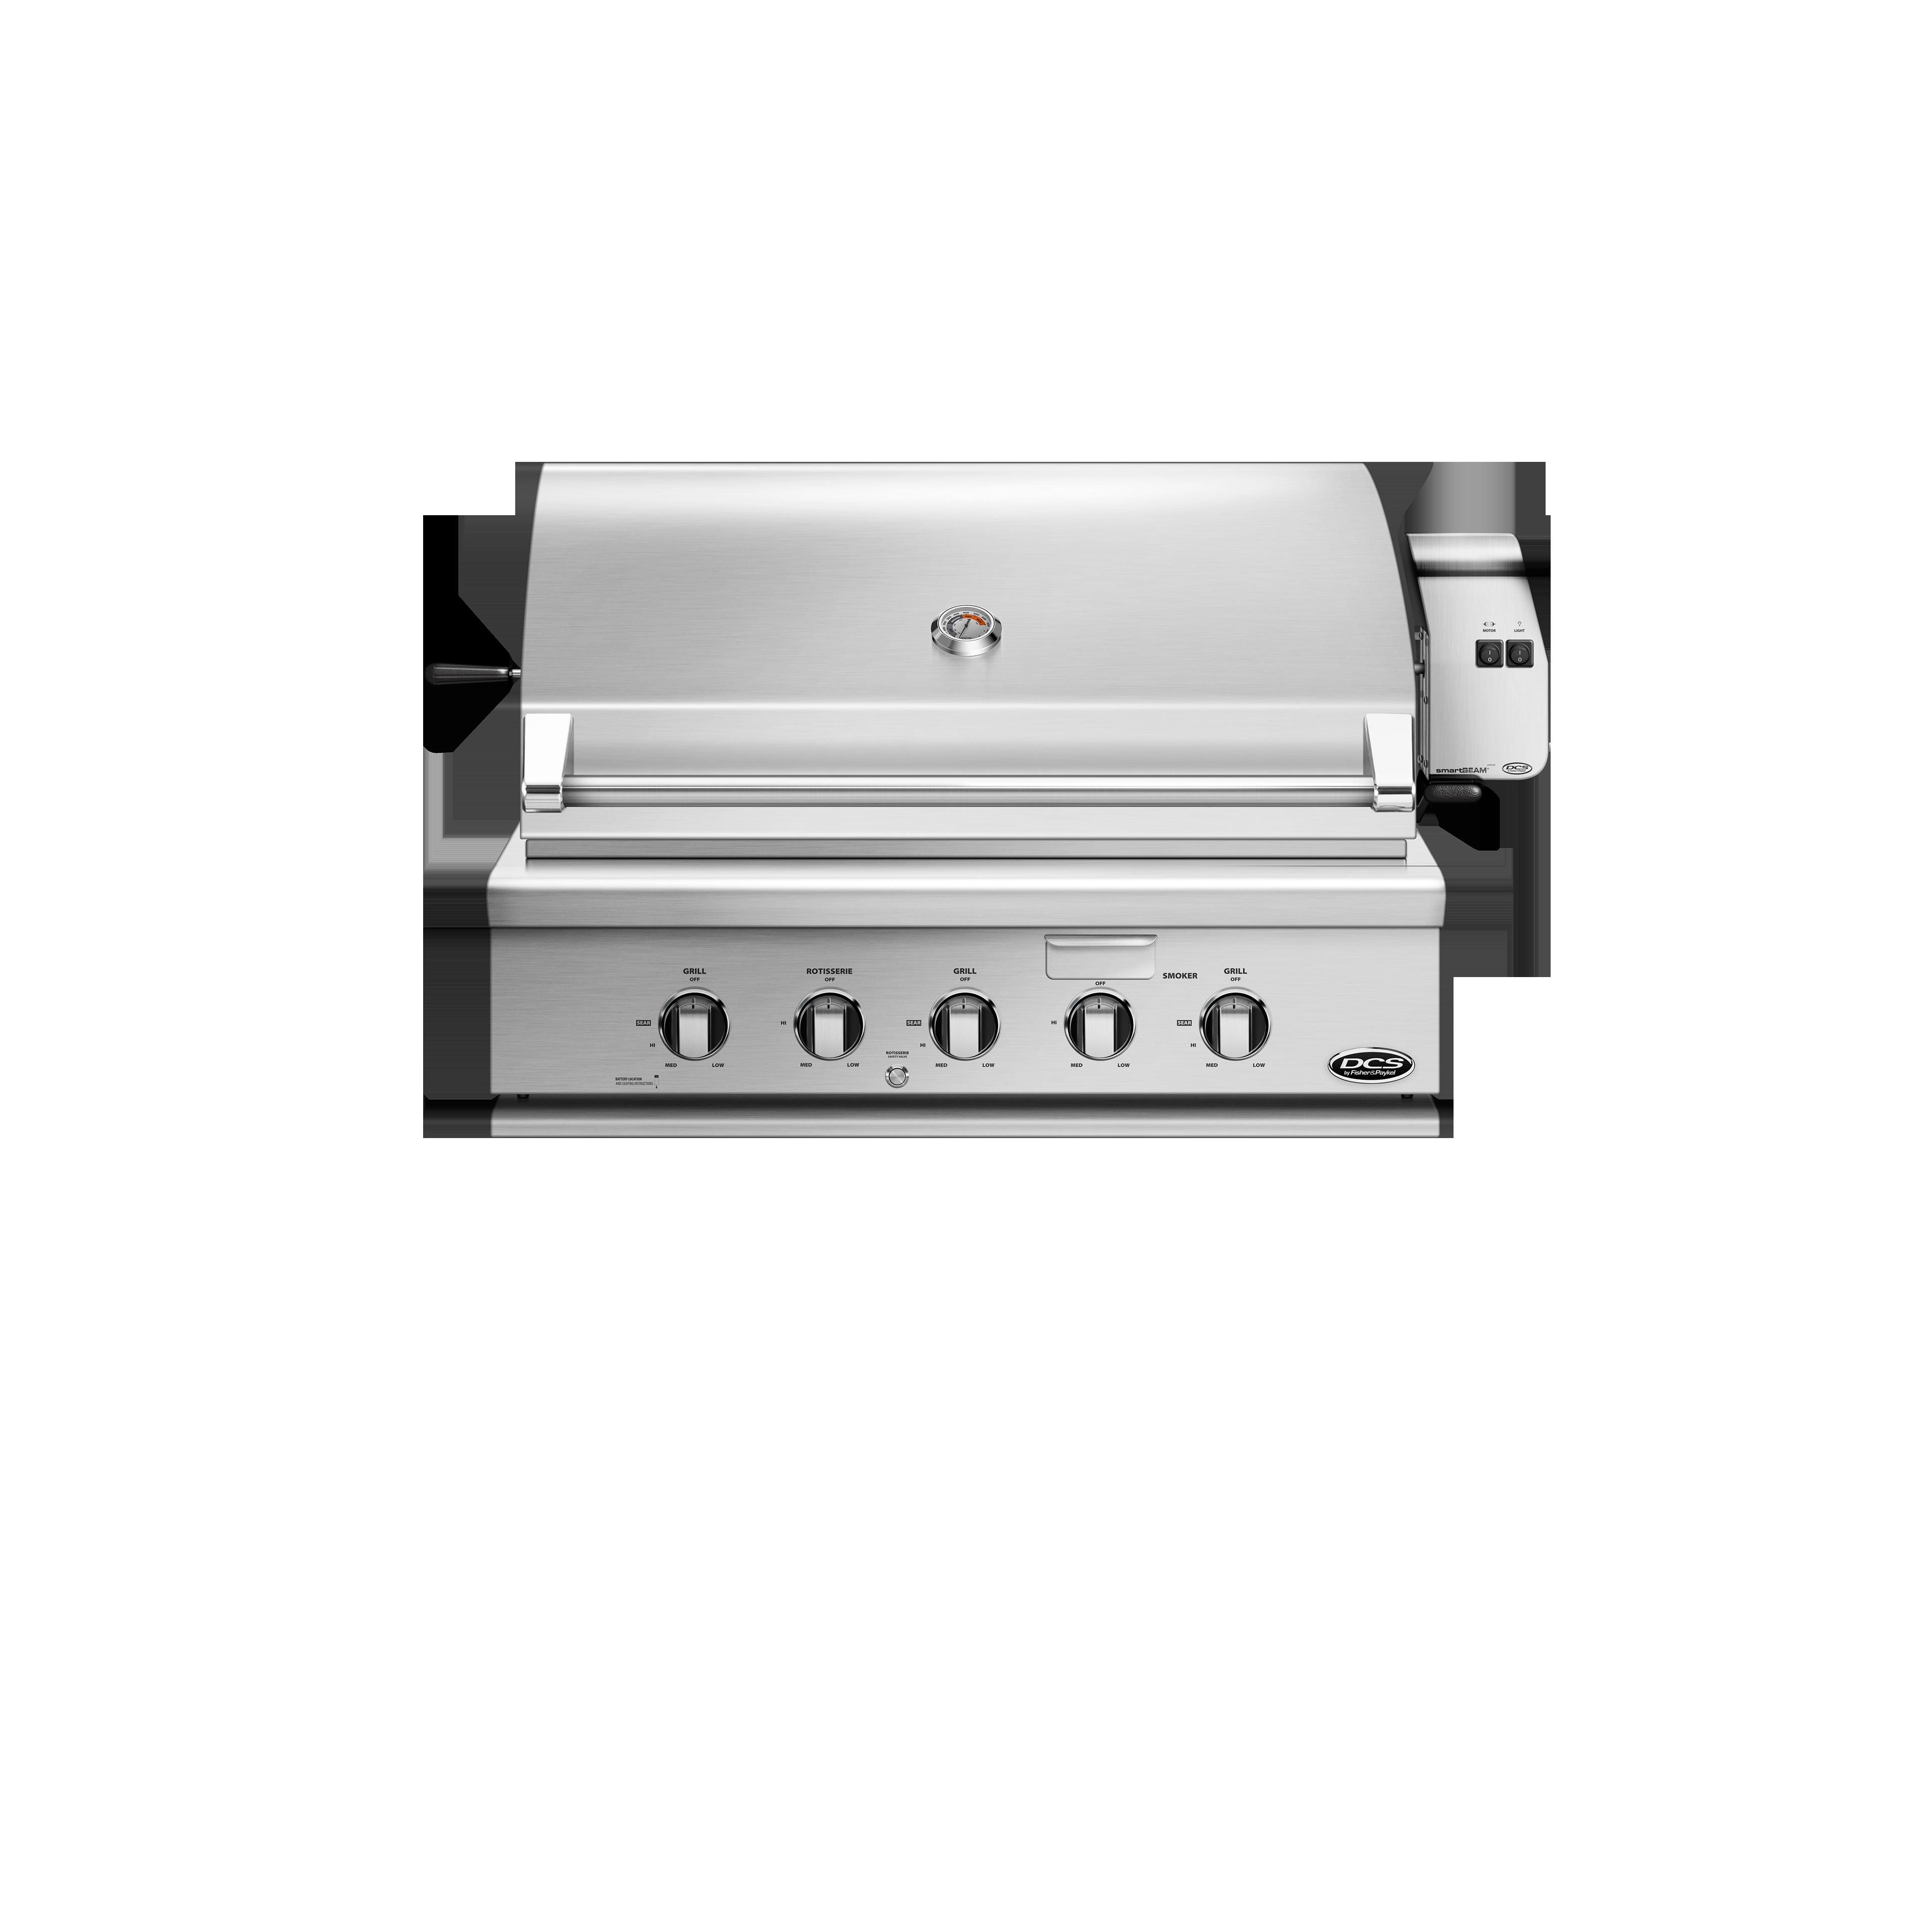 "Model: BH1-36R-L | DCS 36"" Series 7 Grill, LP Gas"